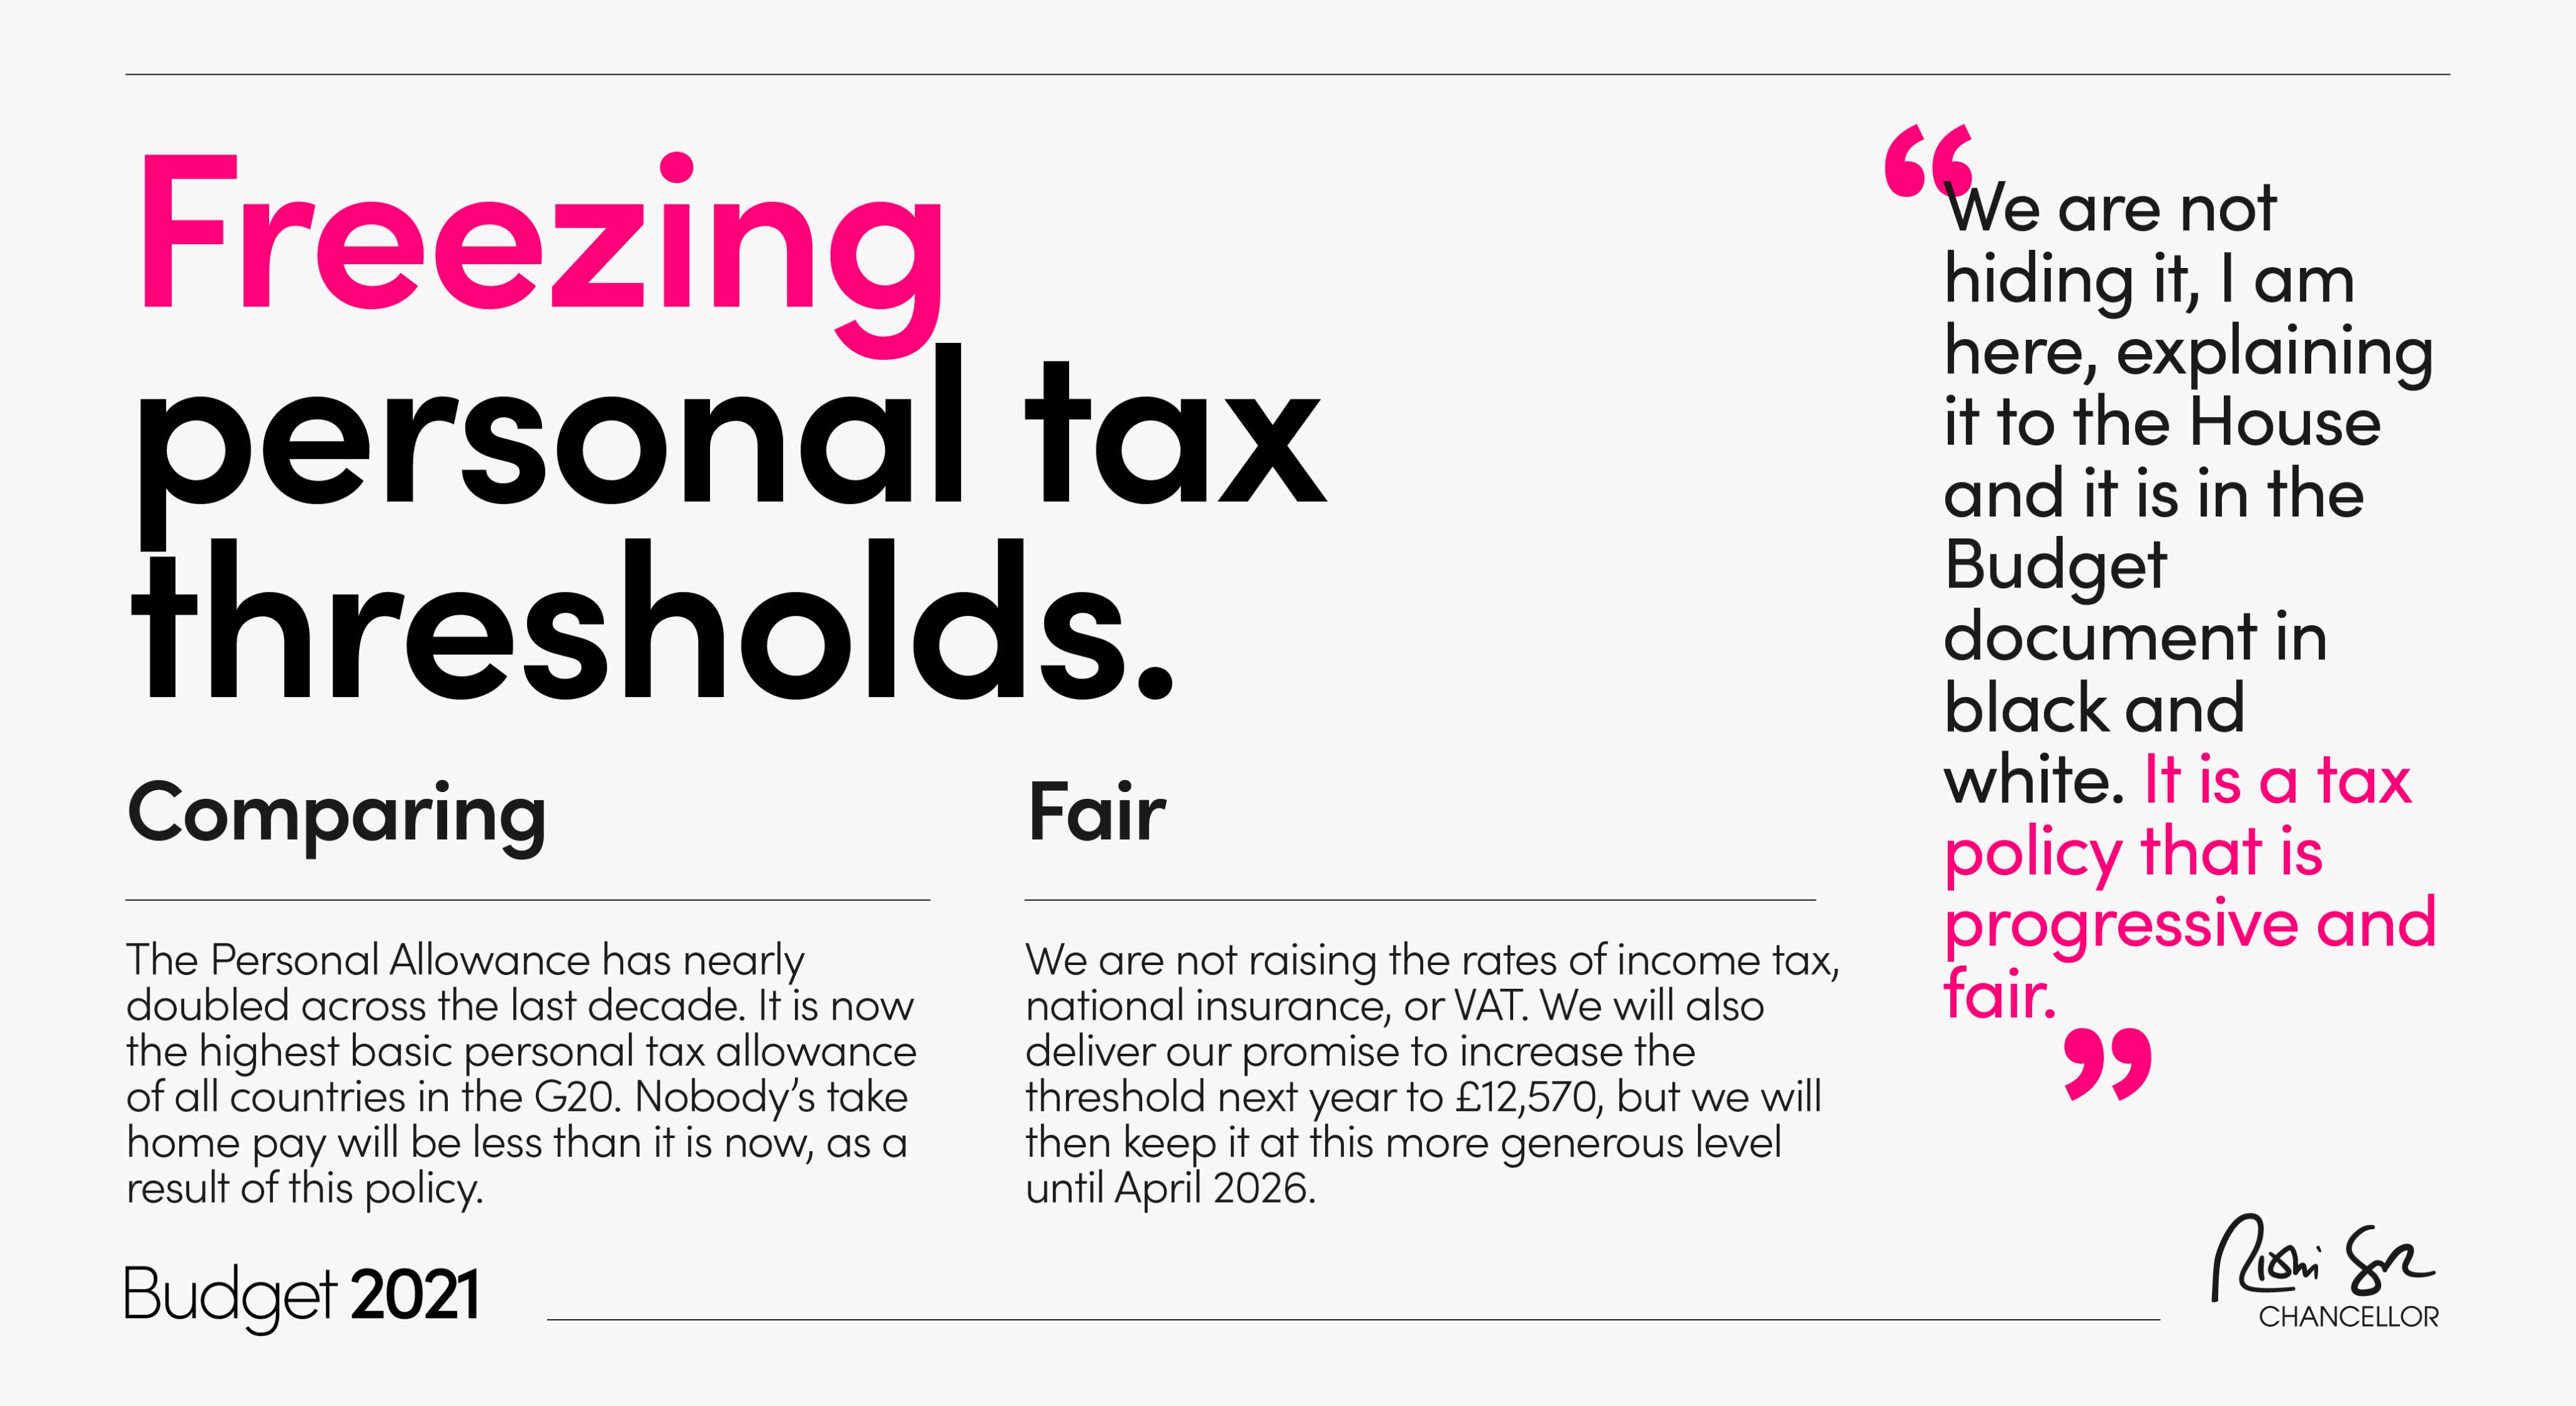 Freezine_Personal_Tax_Thresholds.jpeg